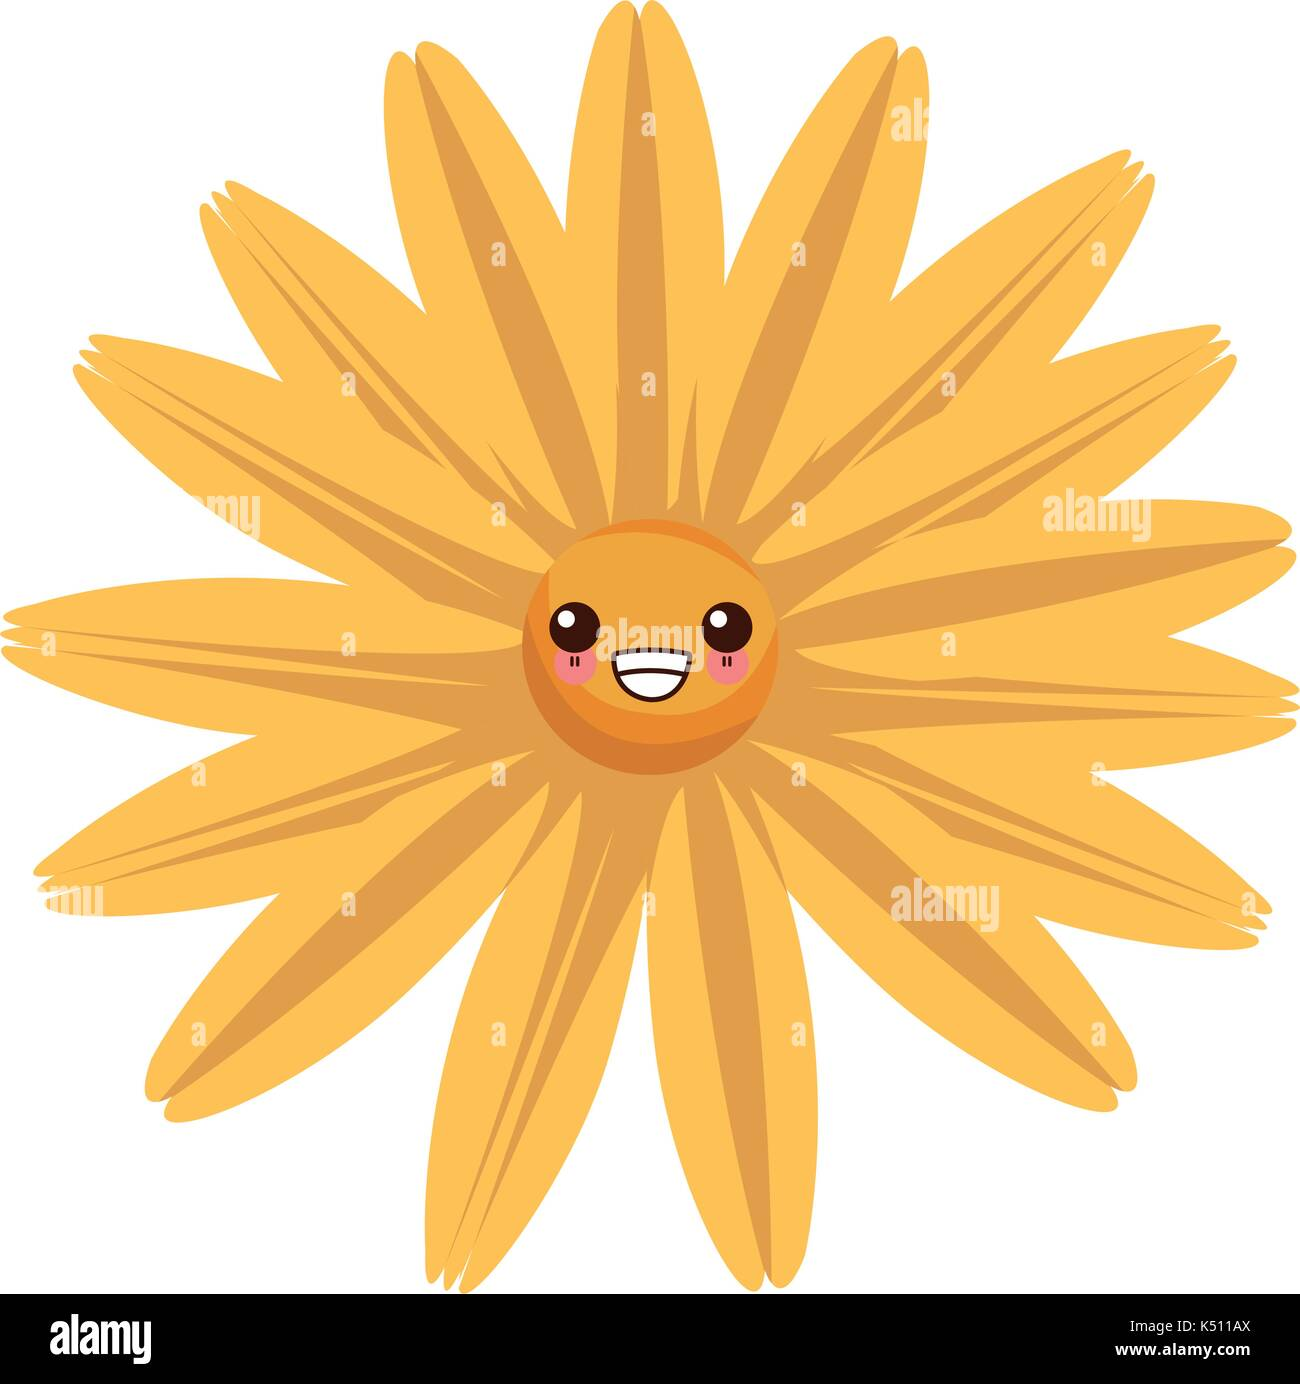 Beautiful flower kawaii cartoon stock vector art illustration beautiful flower kawaii cartoon izmirmasajfo